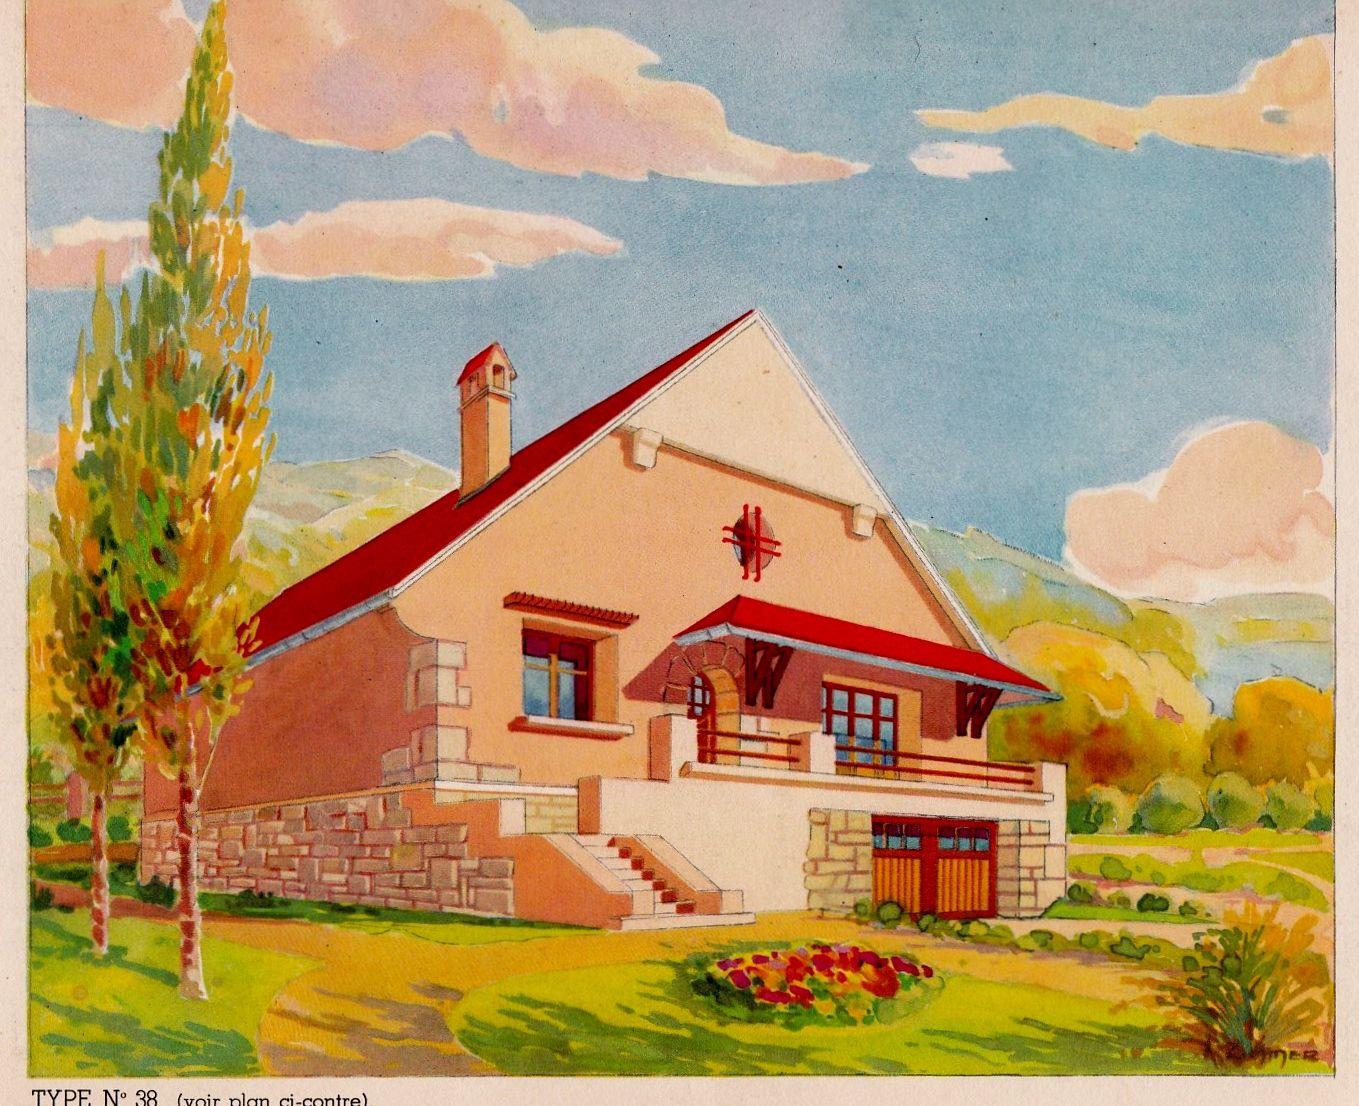 Catalogue par correspondance maison segu maison for Catalogue de jardinage par correspondance